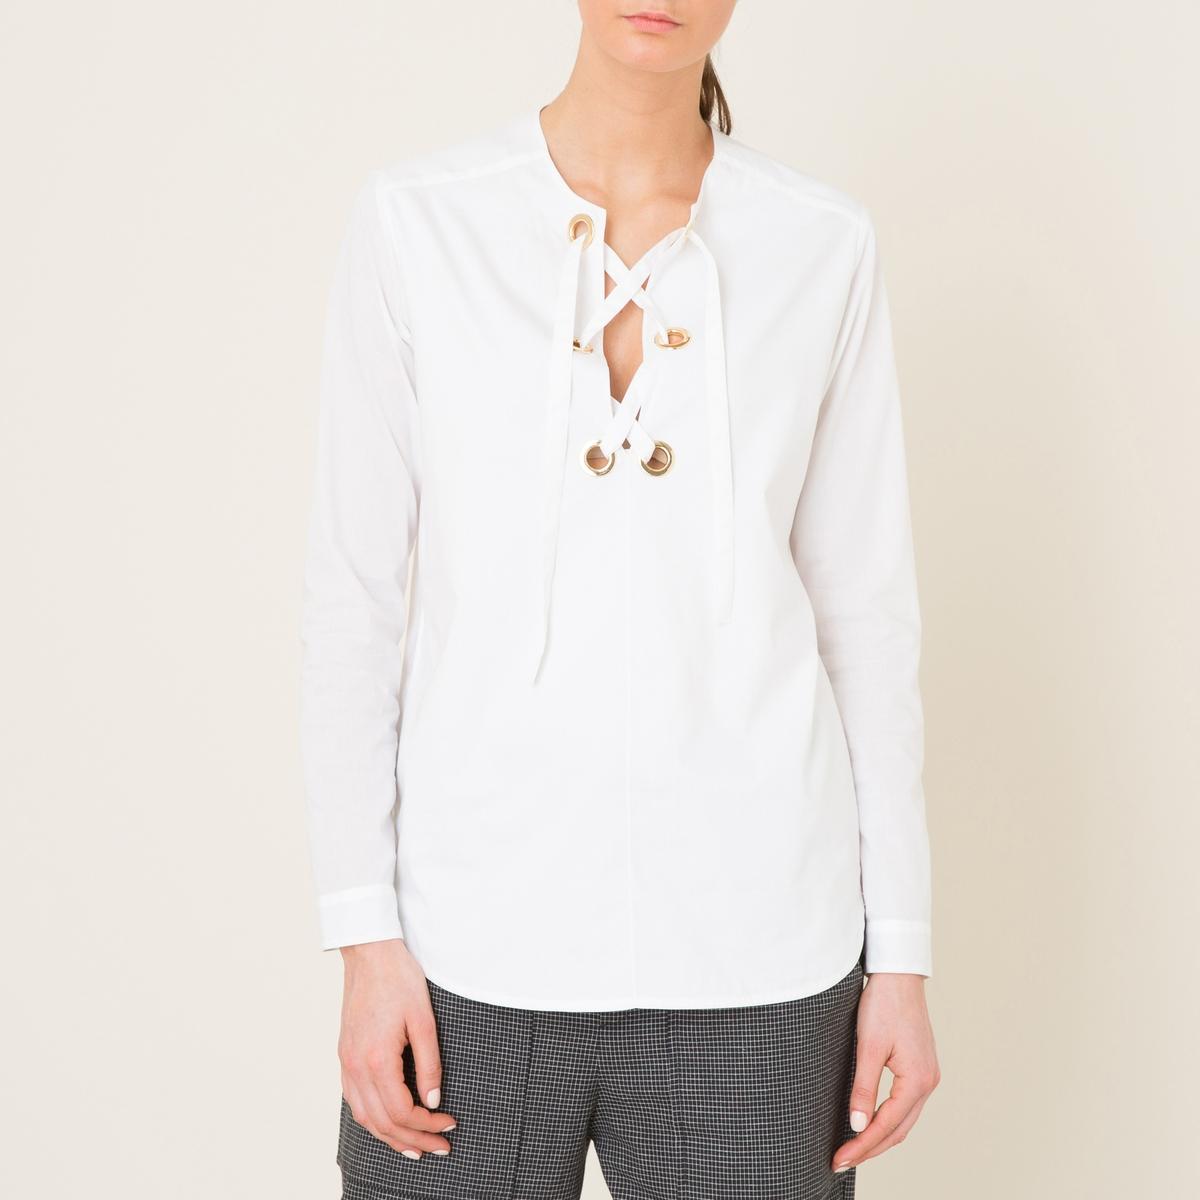 Блузка со шнуровкойСостав и описаниеМатериал : 100% хлопок.Марка : LAURENCE BRAS<br><br>Цвет: белый,темно-синий